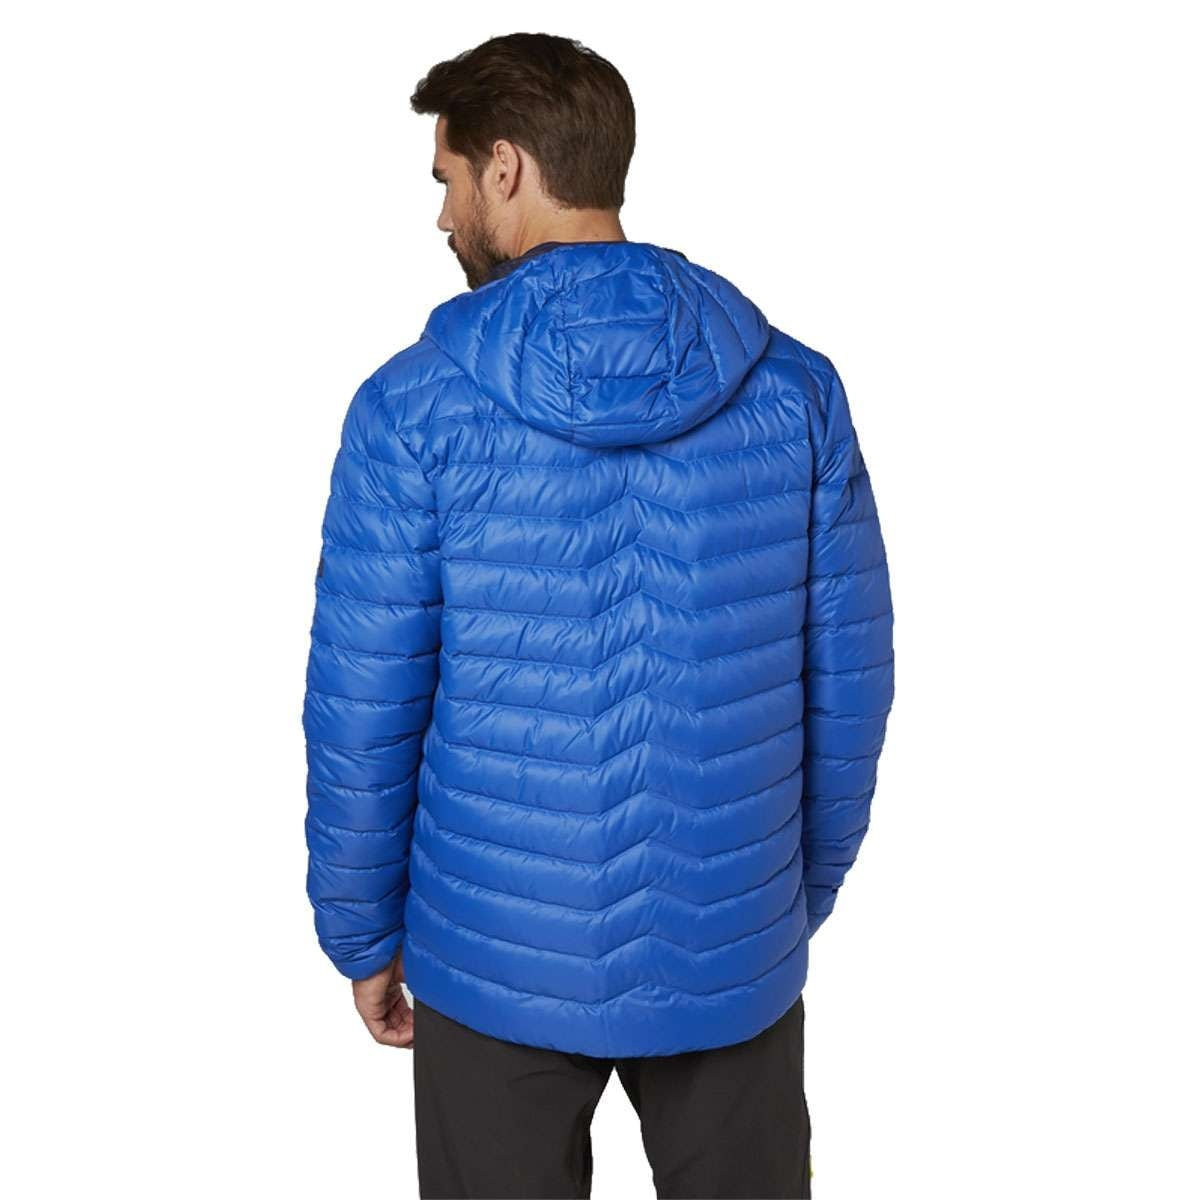 9605c201109 Shop Helly Hansen 2018 Men's Verglas Hooded Down Insulator Jacket - 62773 -  Free Shipping Today - Overstock - 20164565